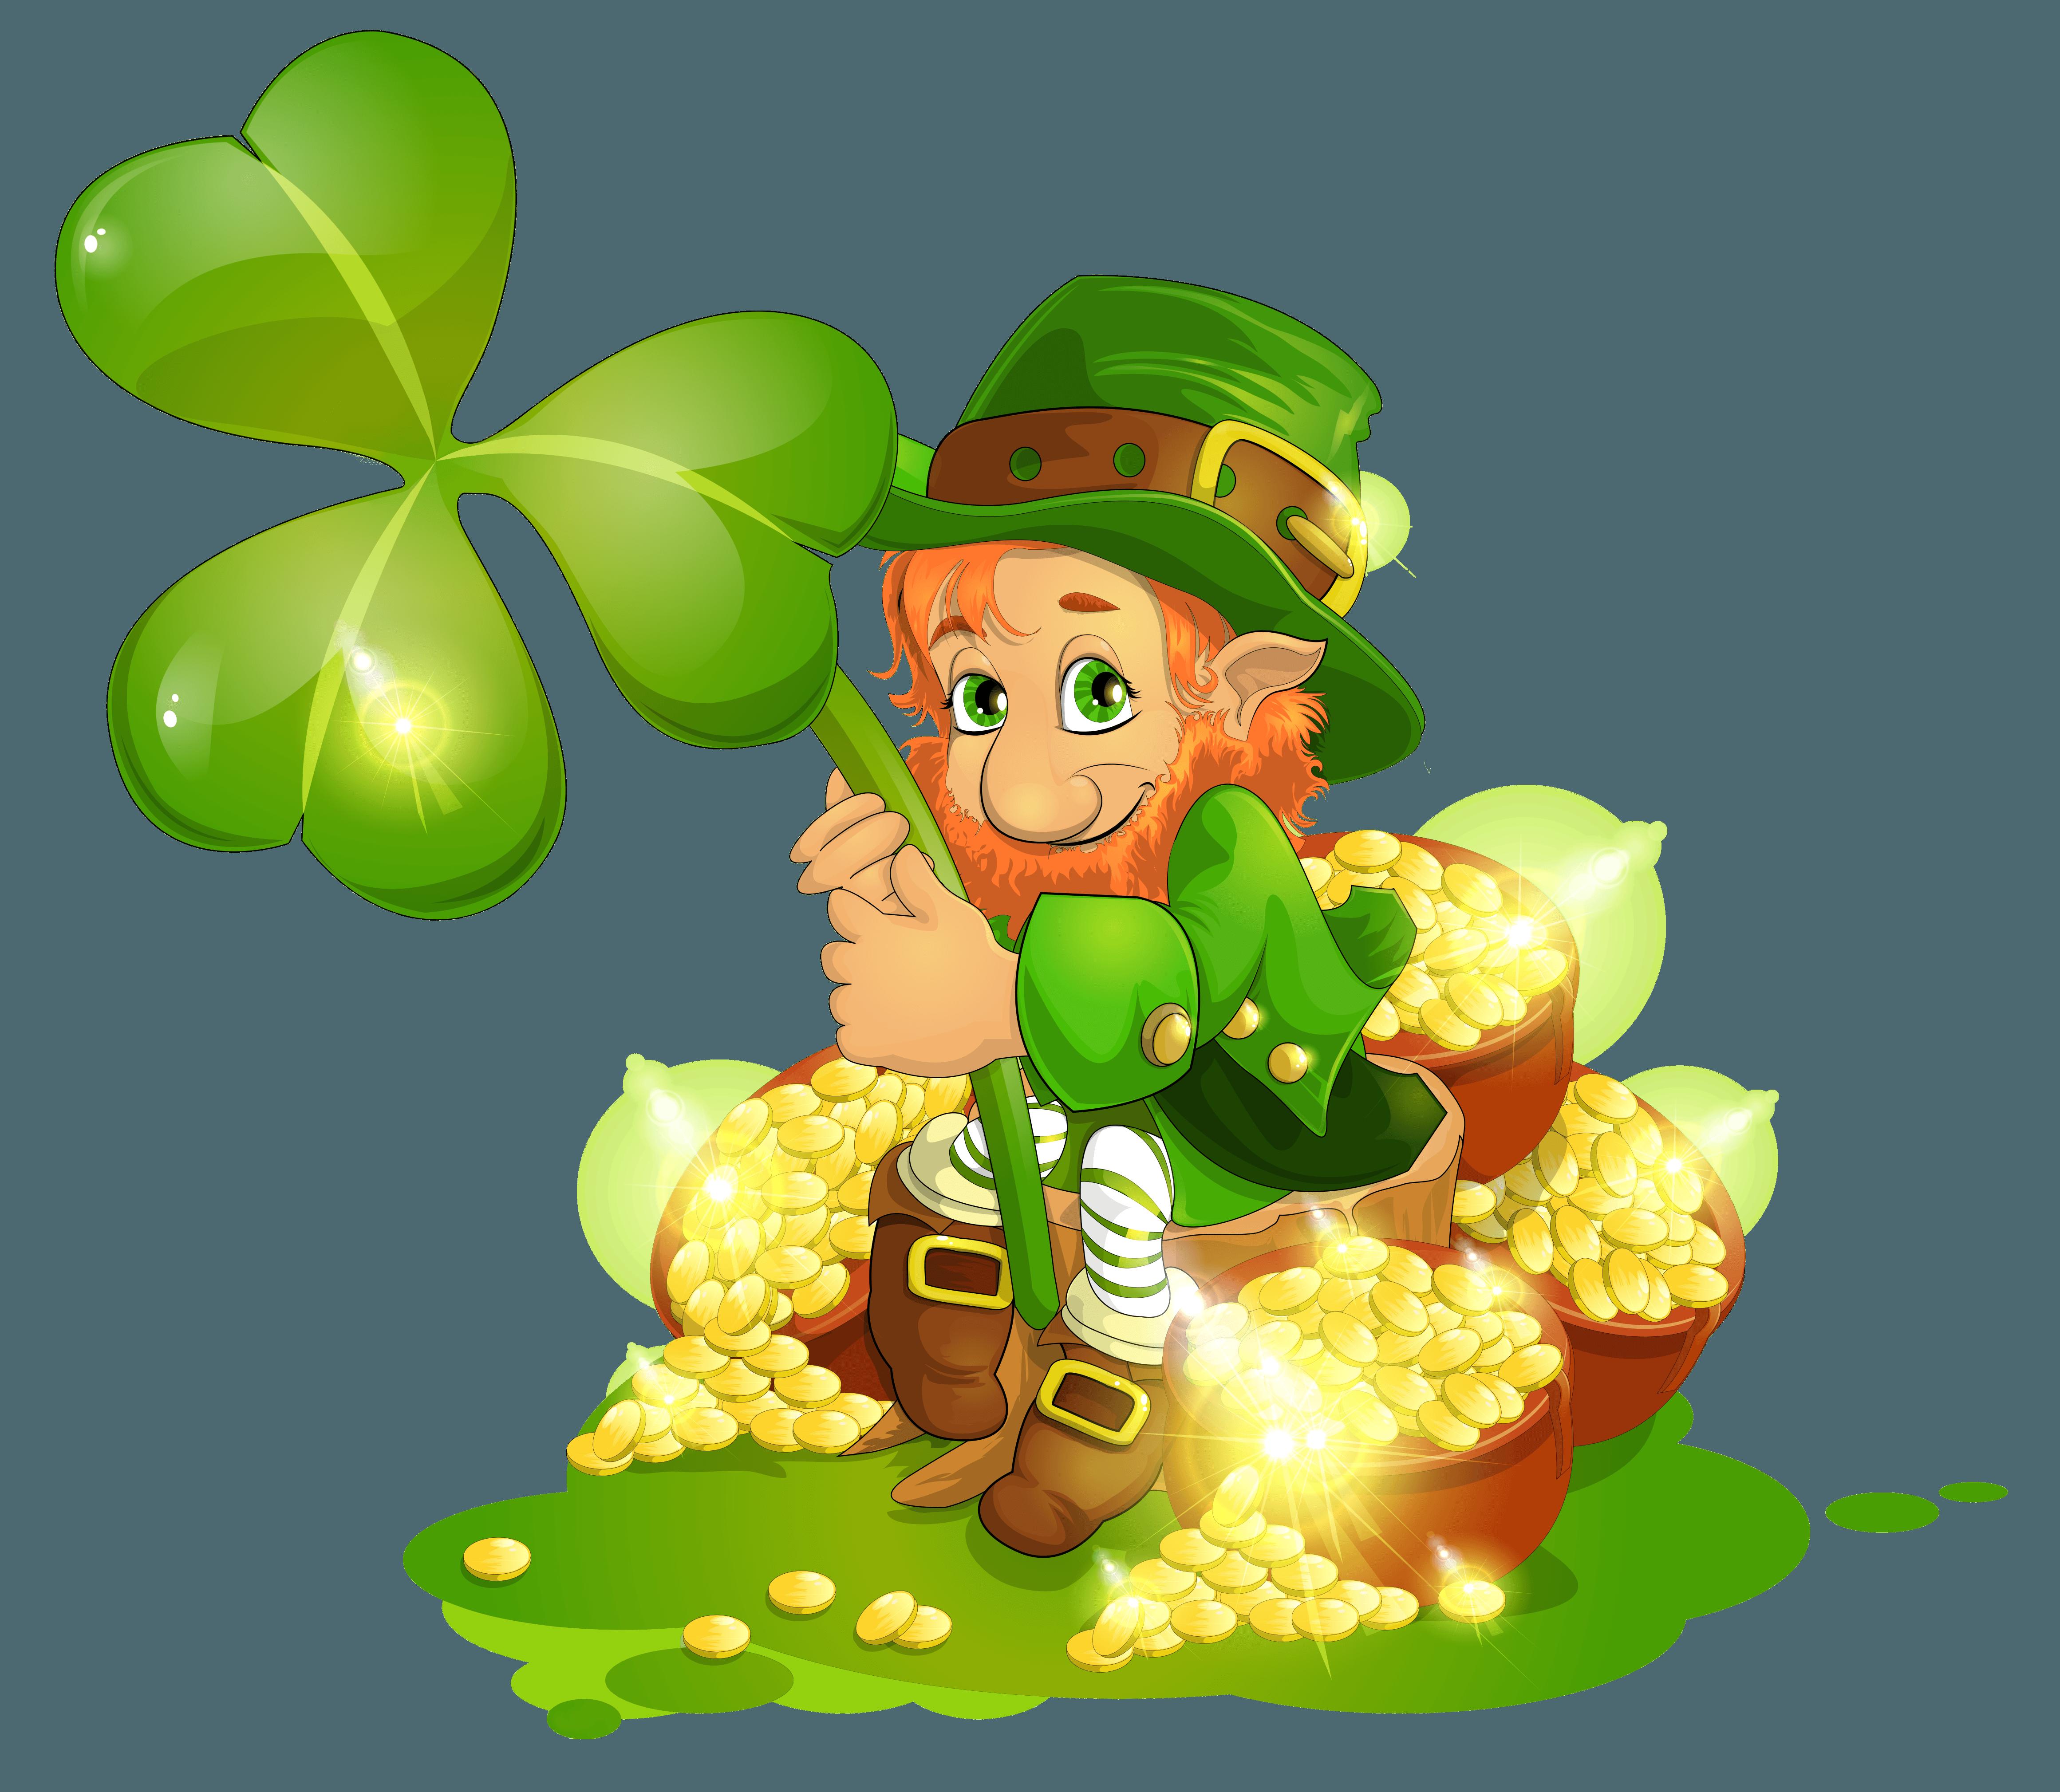 Leprechaun pot of gold clipart - ClipartFest